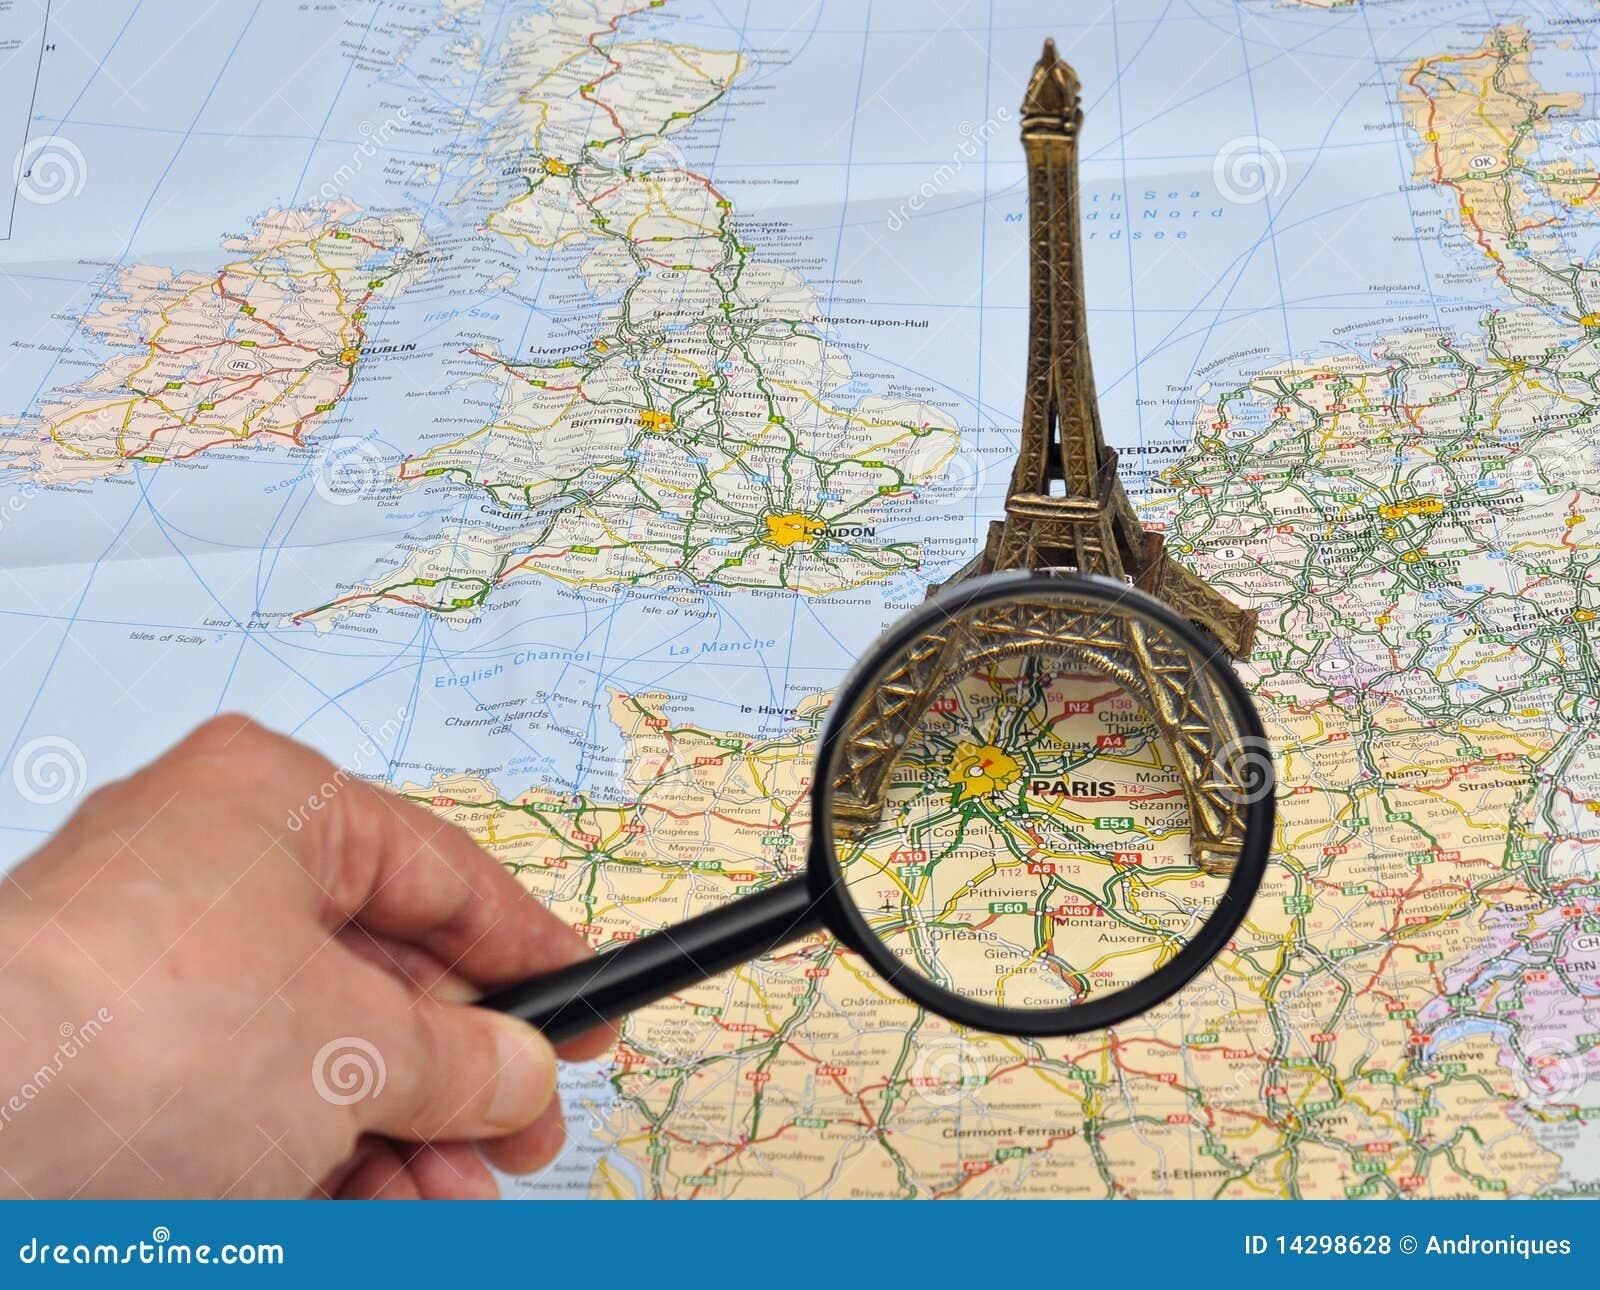 Map Of France Eiffel Tower.France Map Miniature Souvenir Eiffel Tower Paris Stock Photo